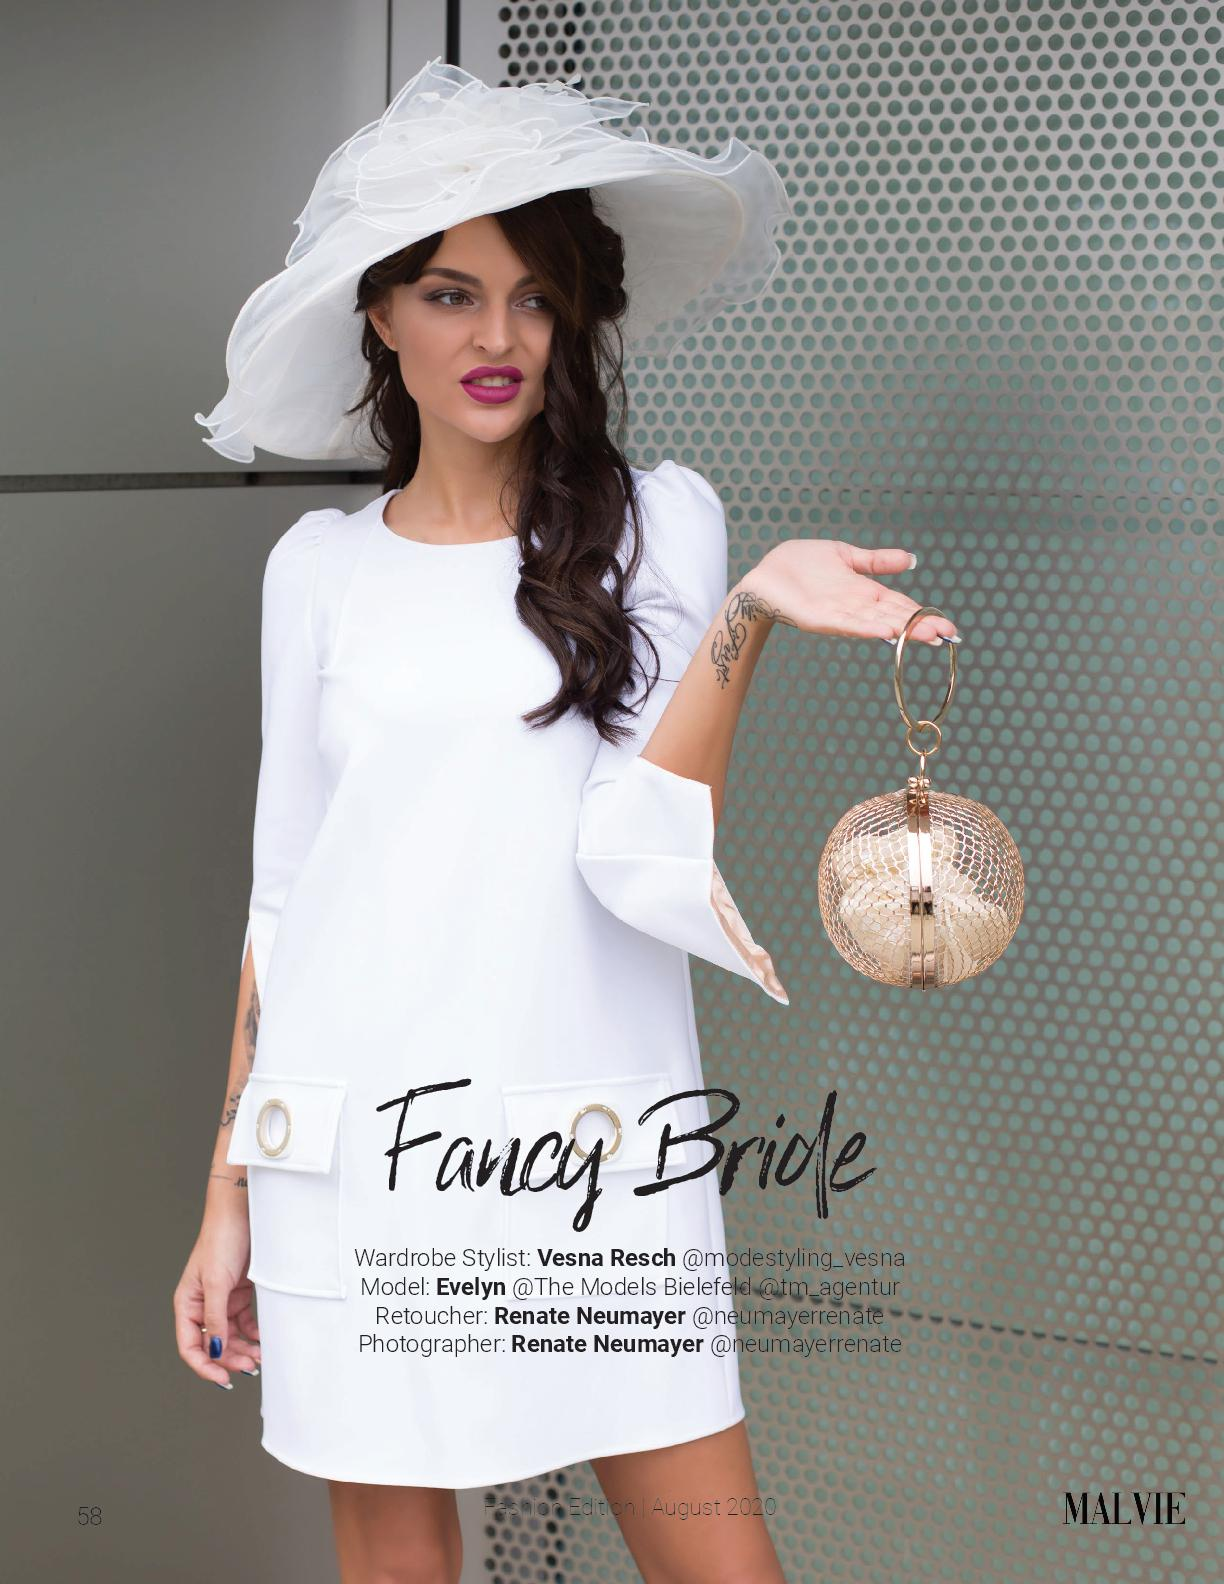 Fancy Bride - MALVIE PARIS, August 2020 Vol. 08